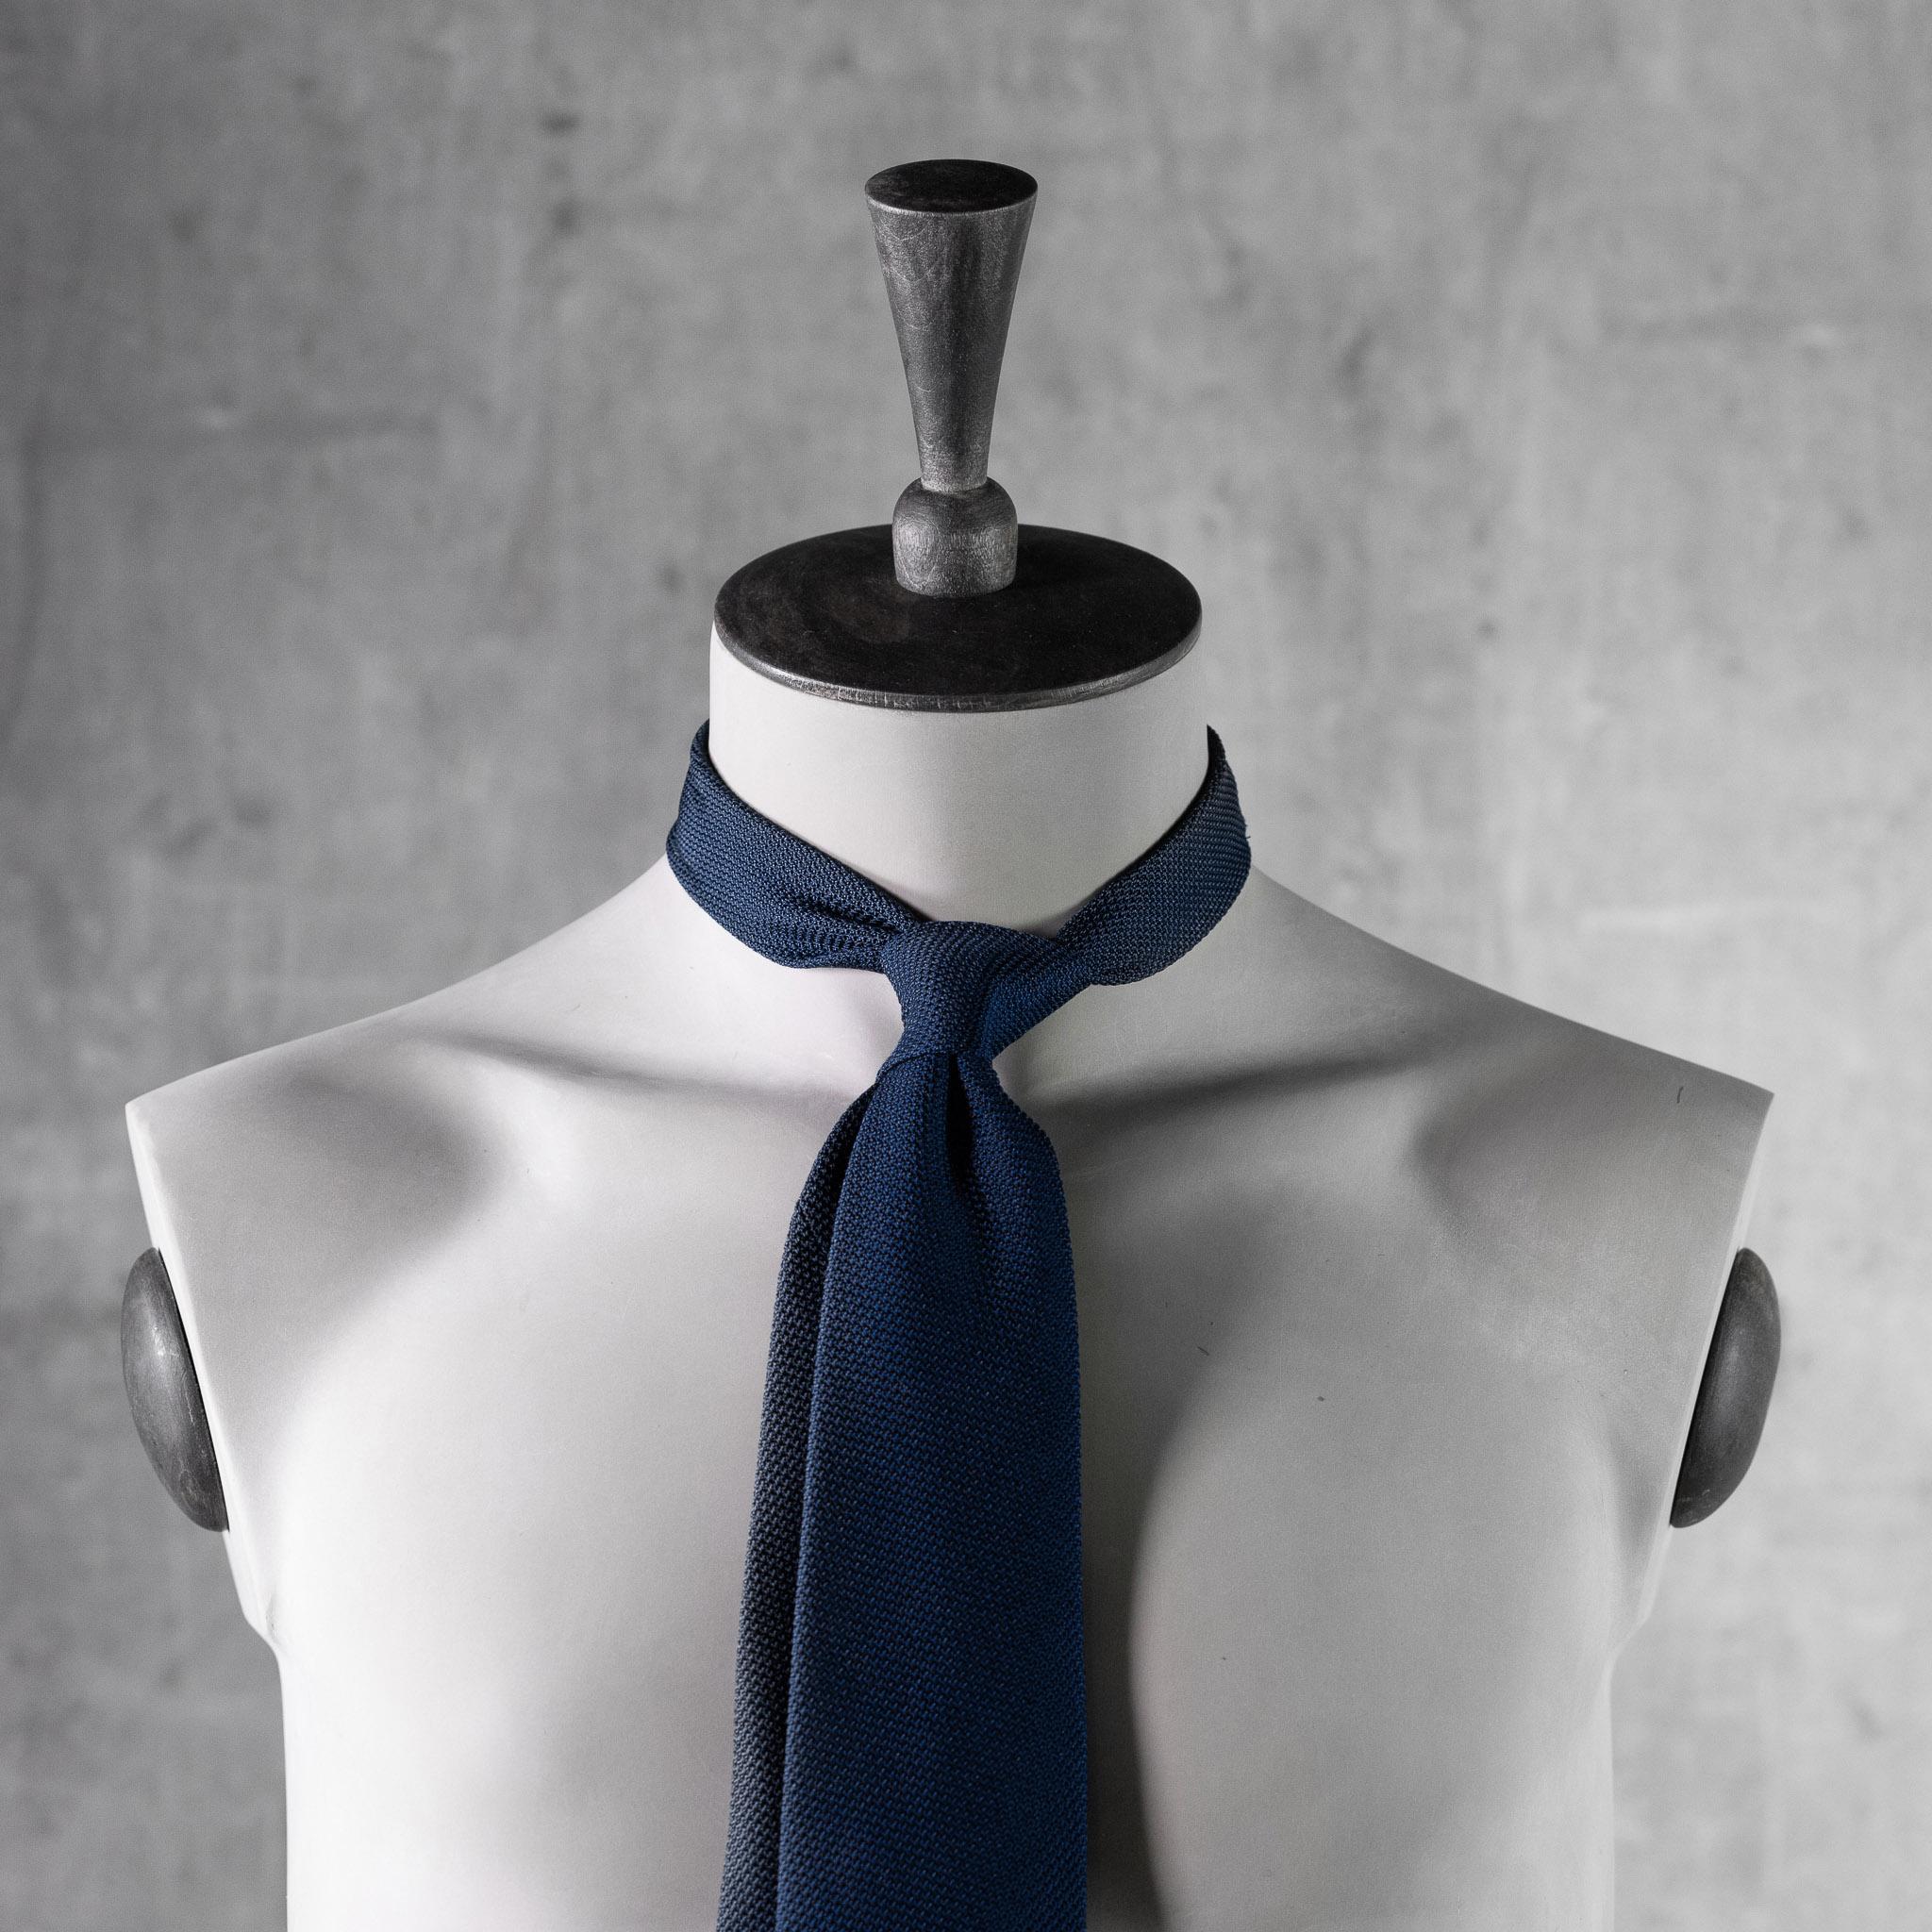 GRENADINE-0280-Tie-Initials-Corbata-Iniciales-The-Seelk-4